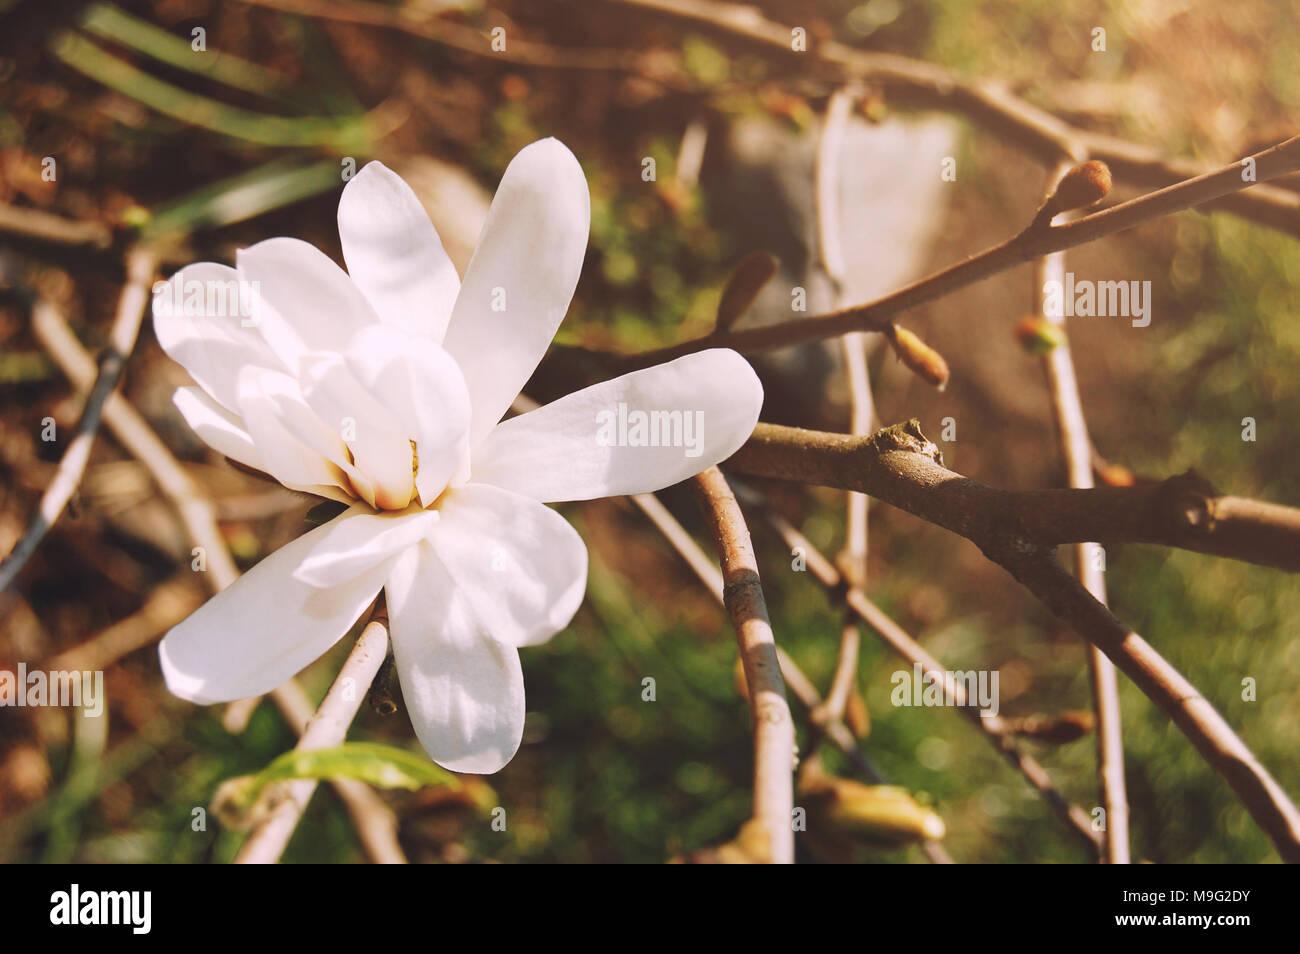 Spring flowers beautifully blossoming tree branch magnolia tree spring flowers beautifully blossoming tree branch magnolia tree blossom spring season mightylinksfo